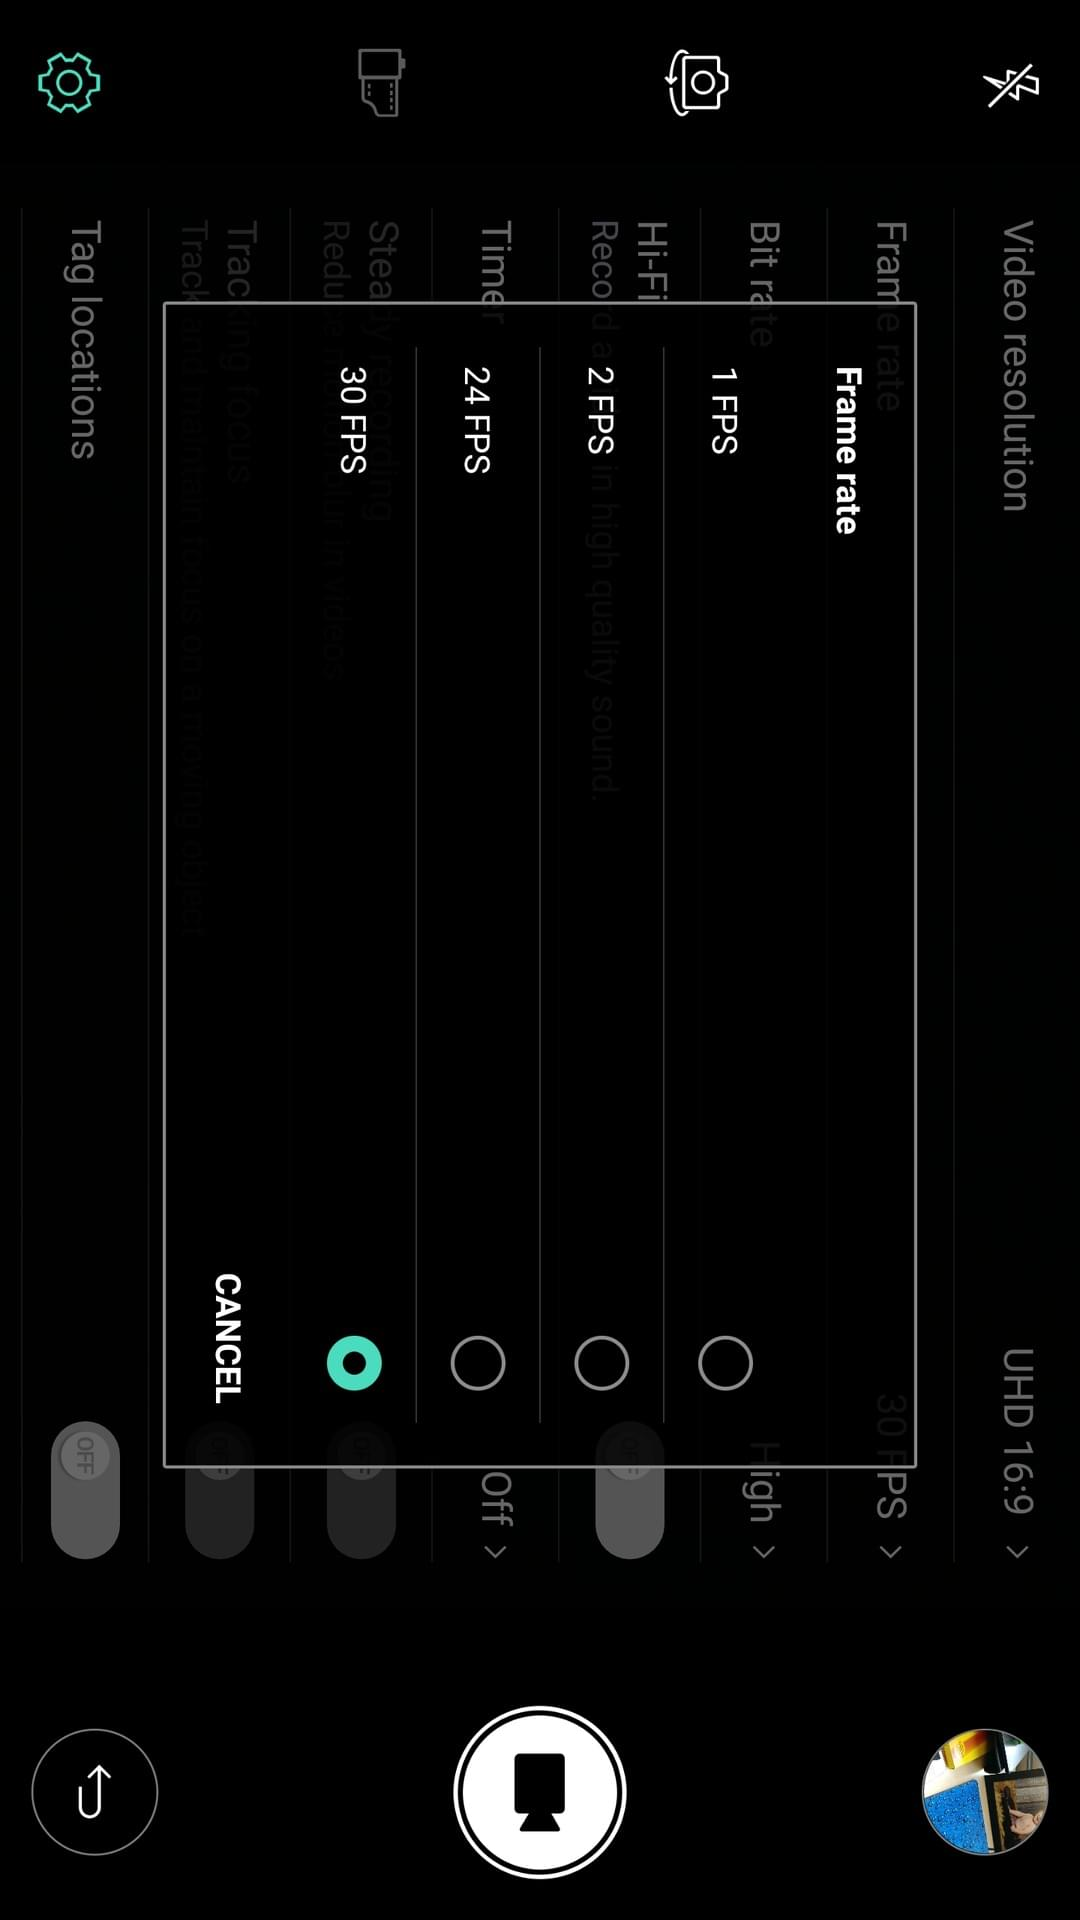 LG V20 AH NS screenshots camera manual video options 3